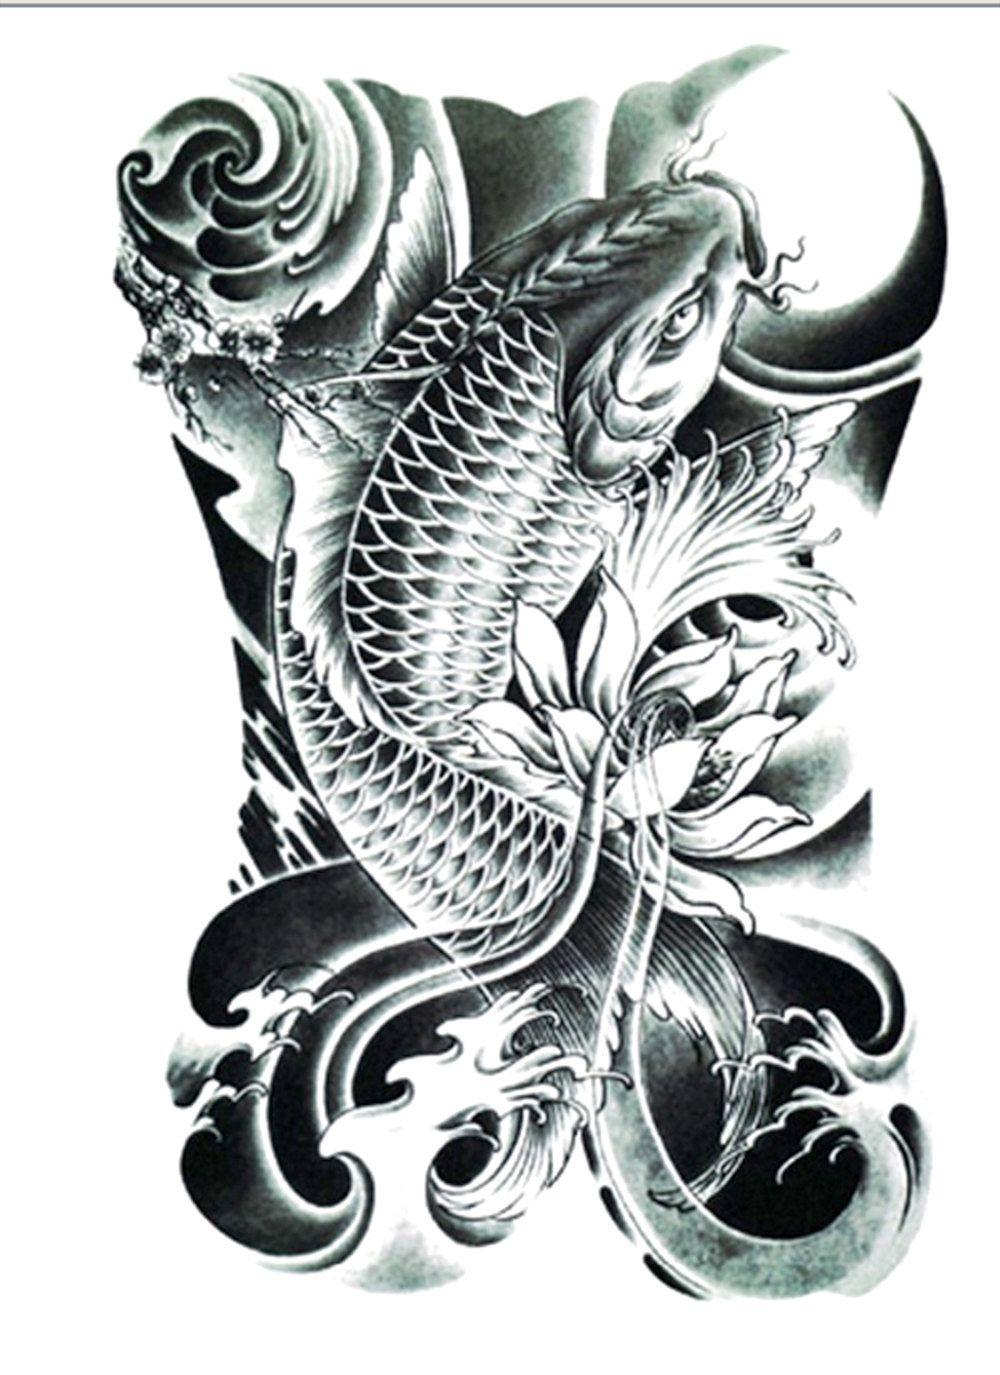 Black And Grey Koi Fish Sleeve Tattoos: Realistic Koi Tattoo/Large Size By FlashTattoosLA On Etsy